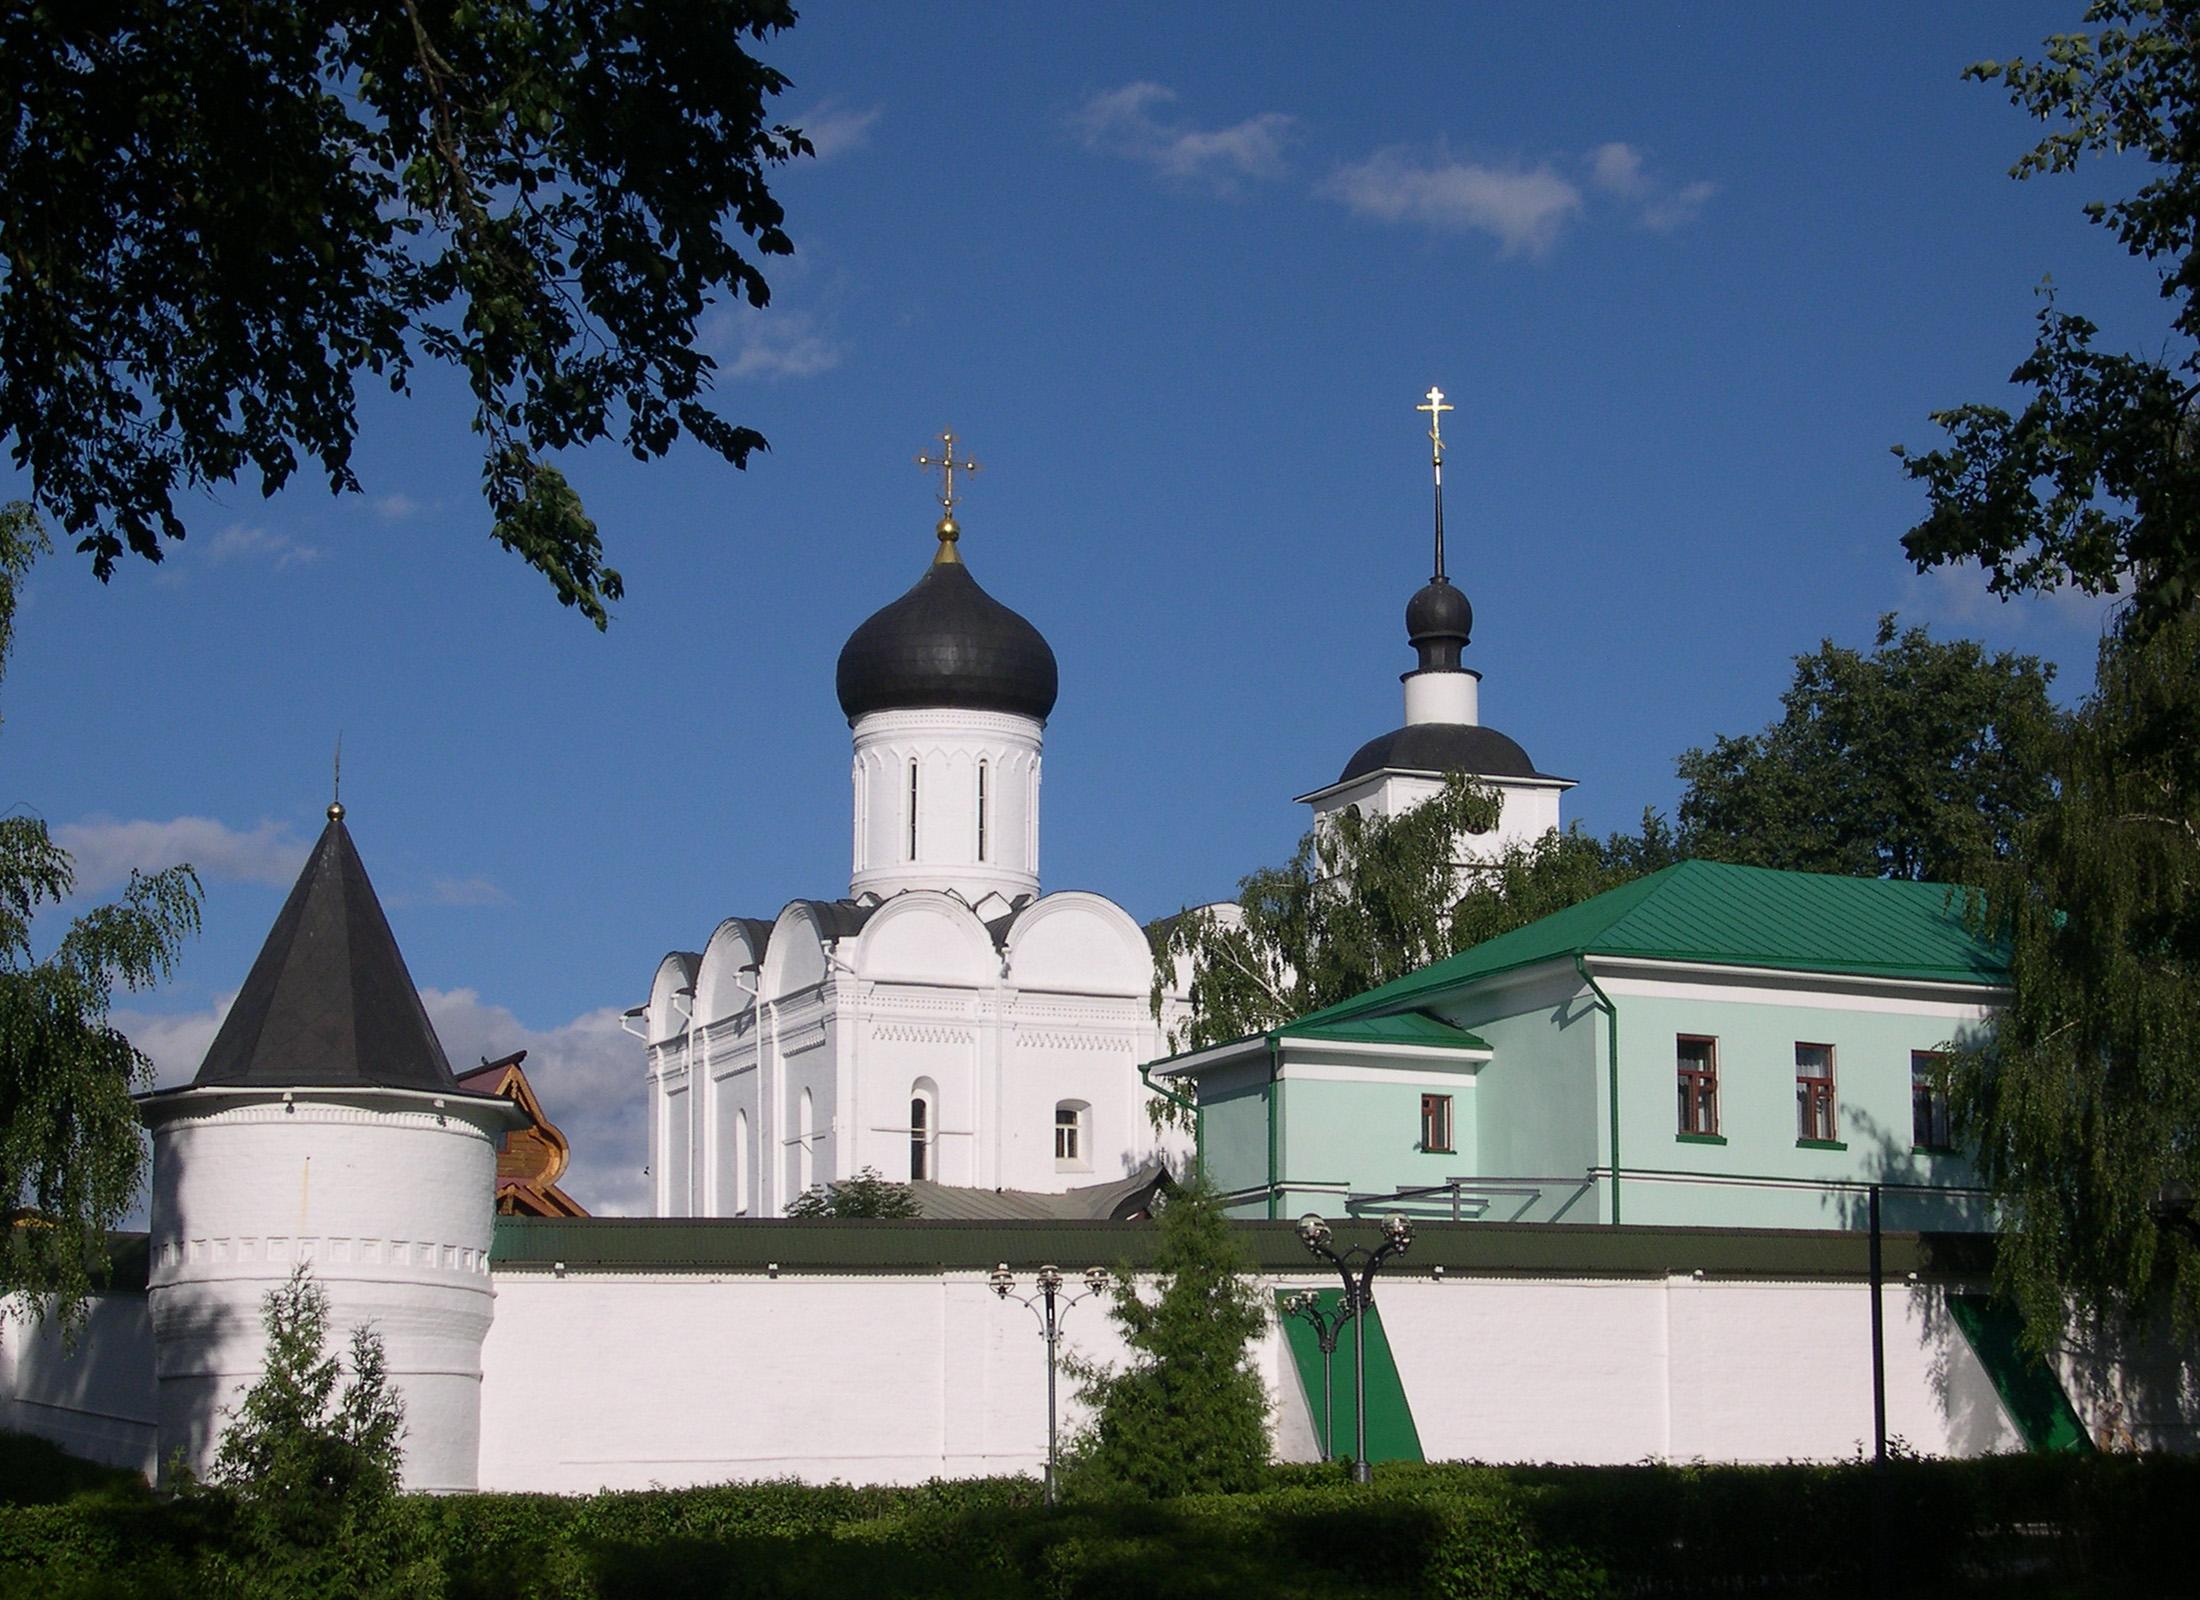 Borisoglebsky Monastery in Dmitrov. History, description, interesting facts 49